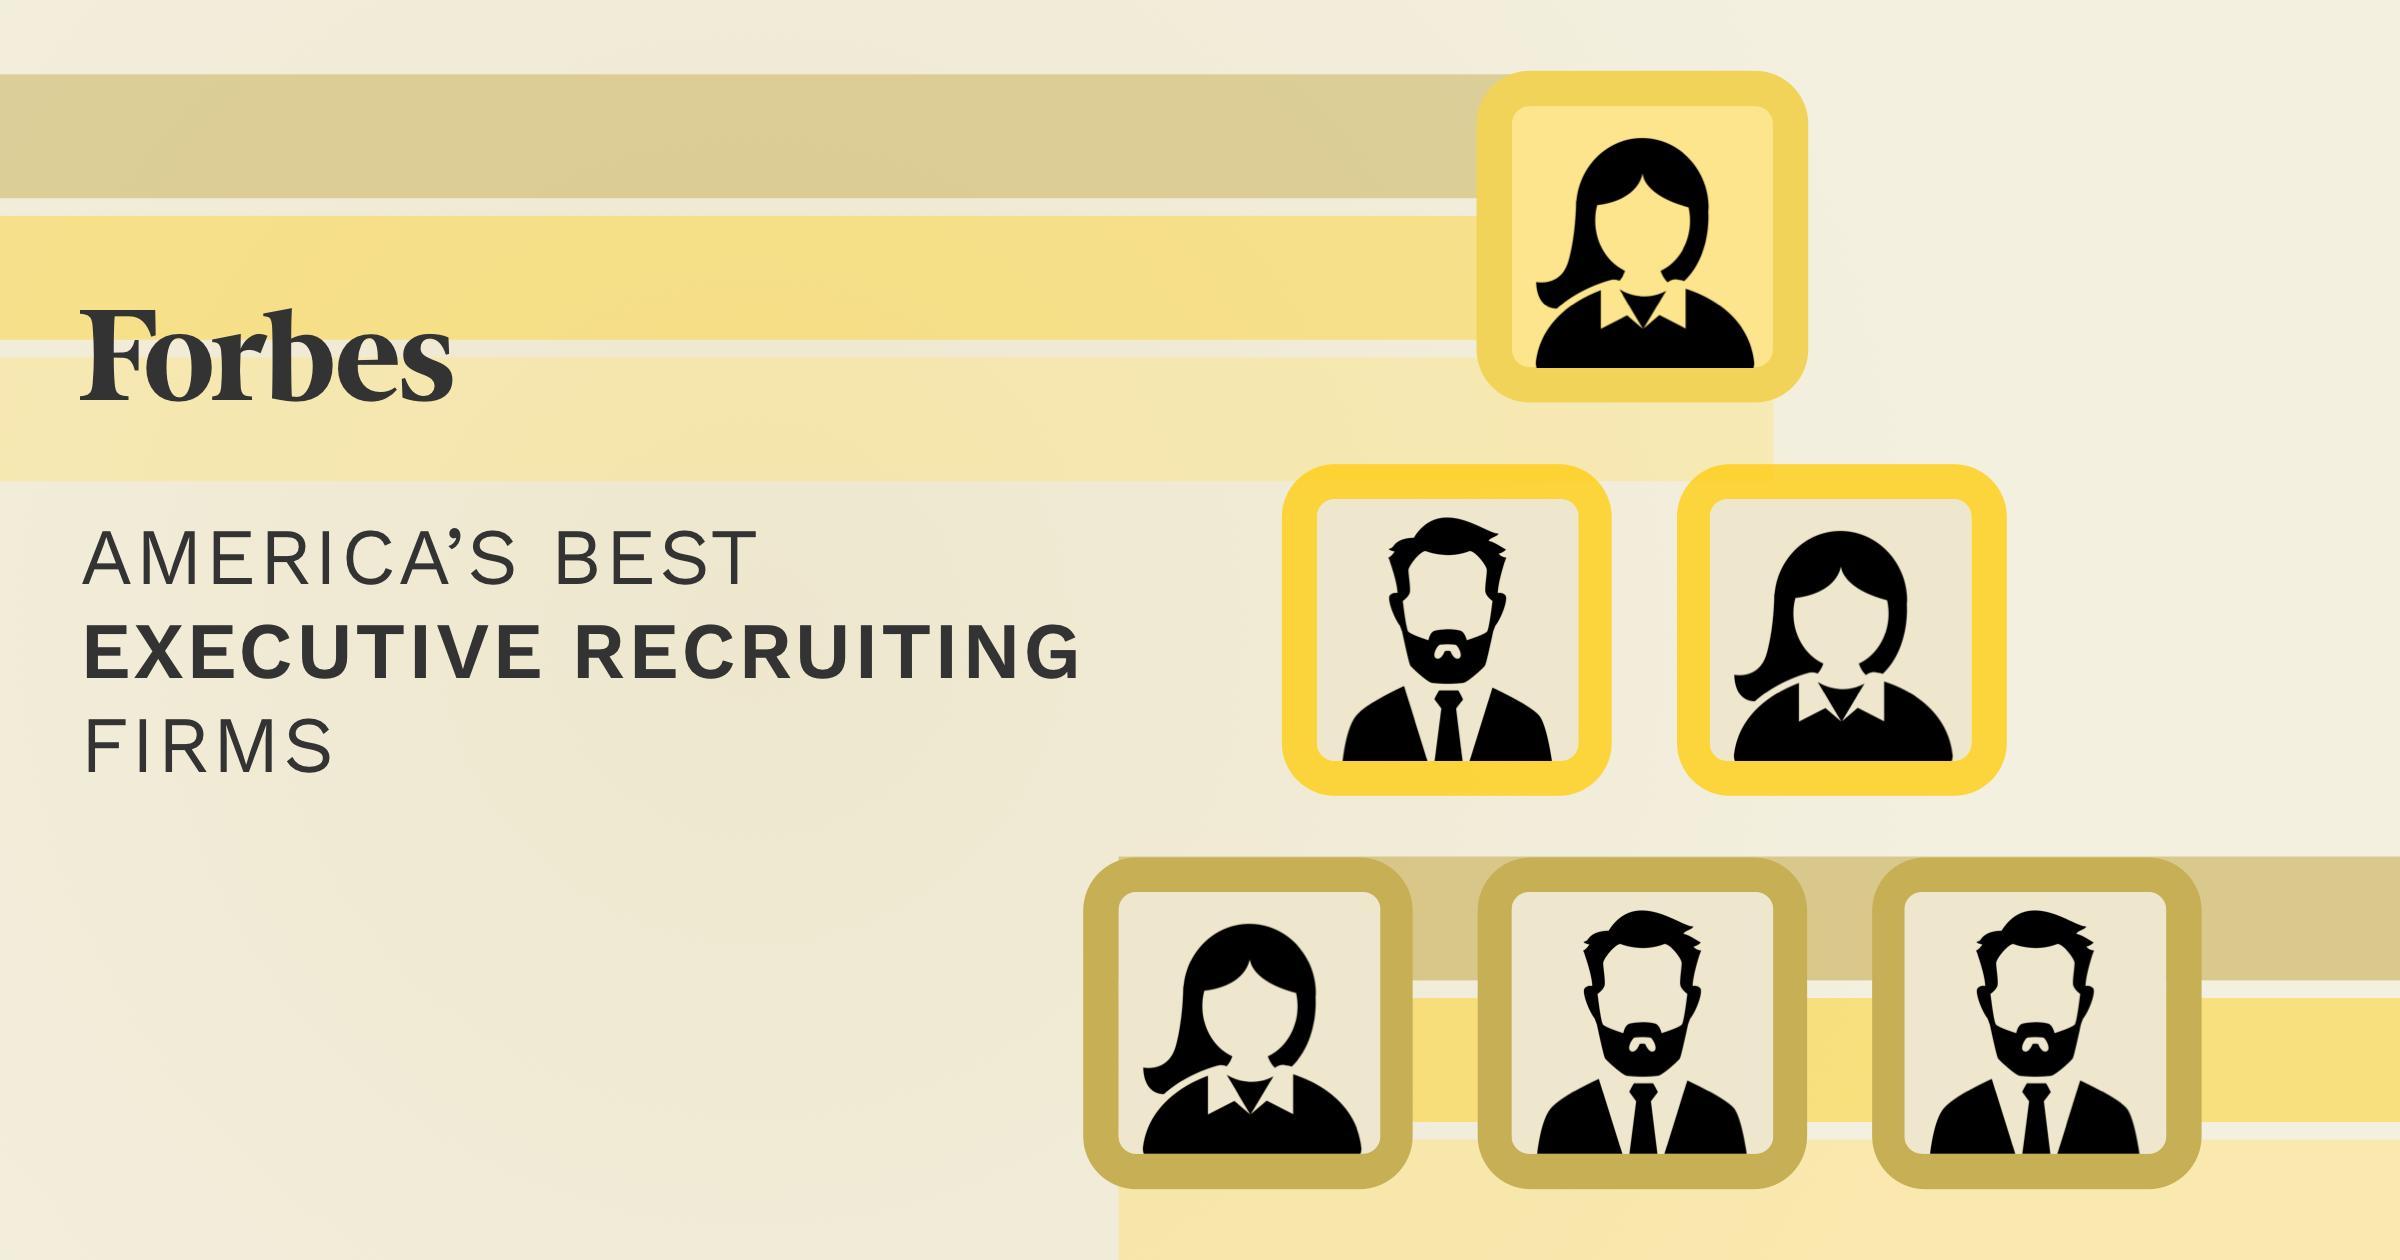 America's Best Executive Recruiting Firms